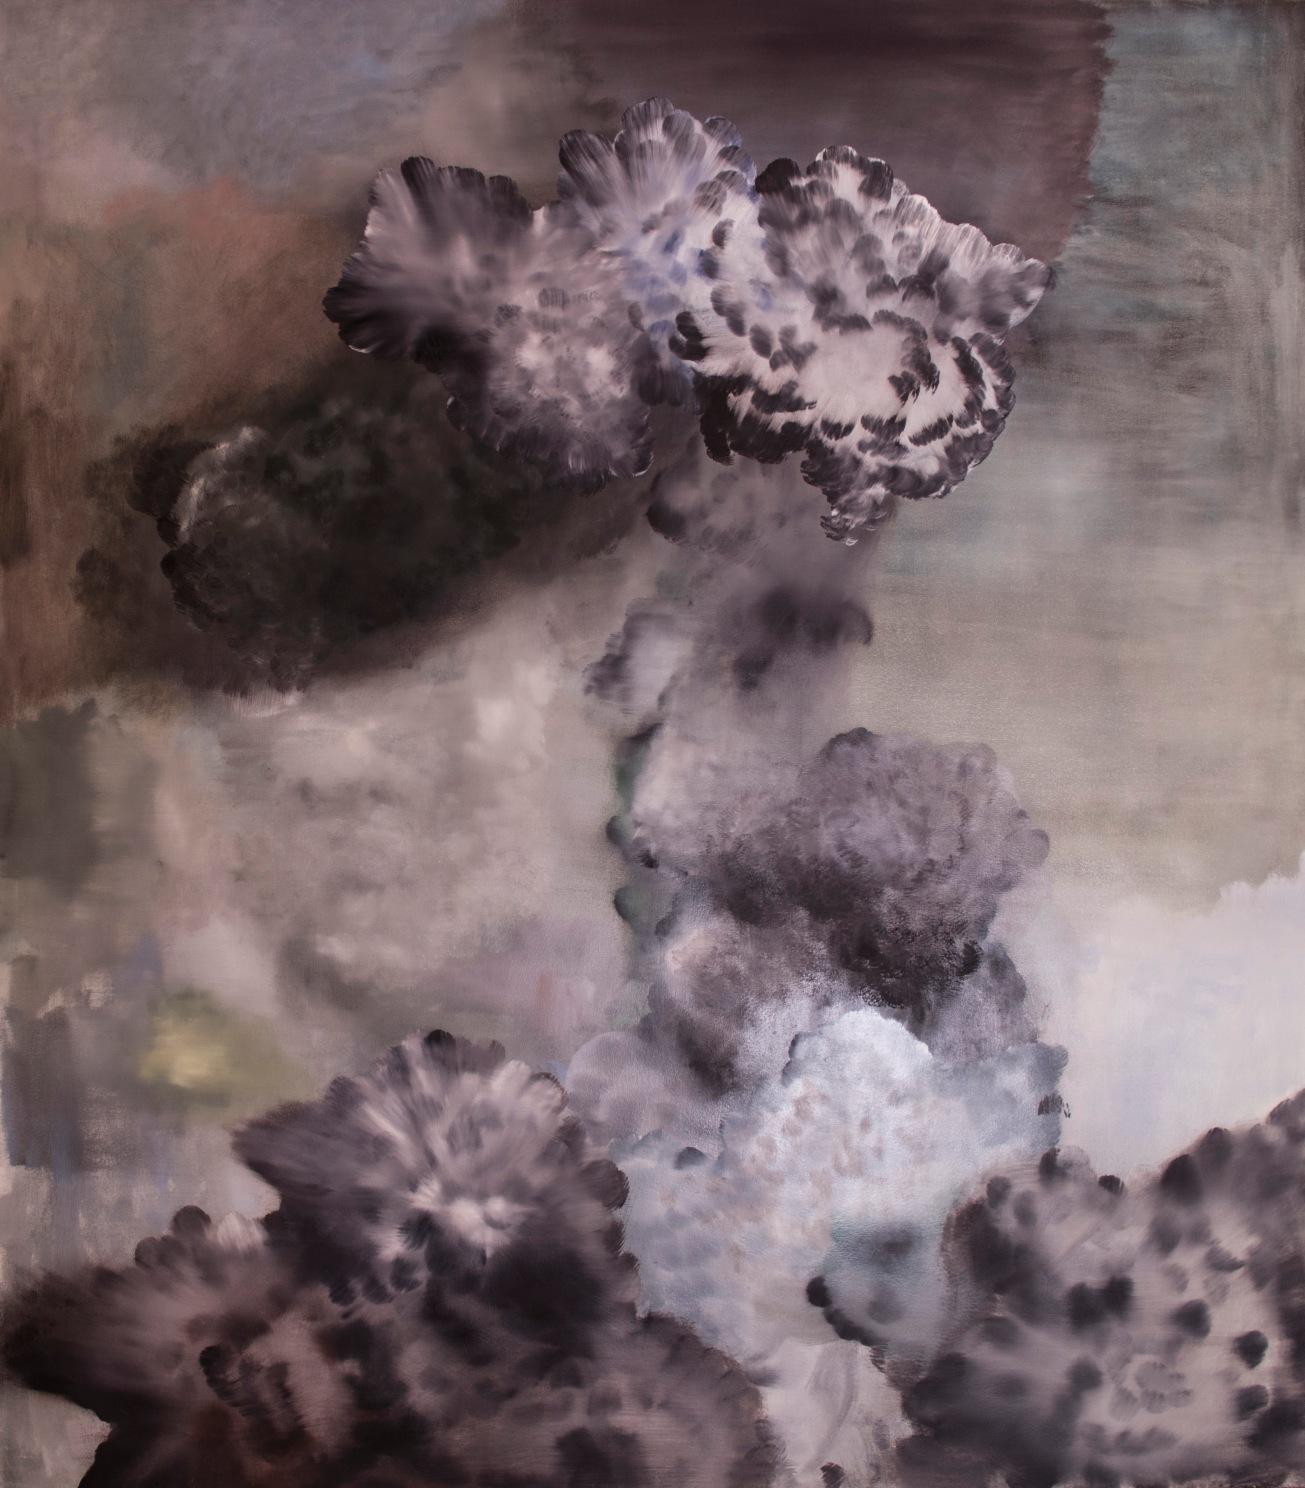 Cordite, Oil on canvas 1800x 1600mm, 2017